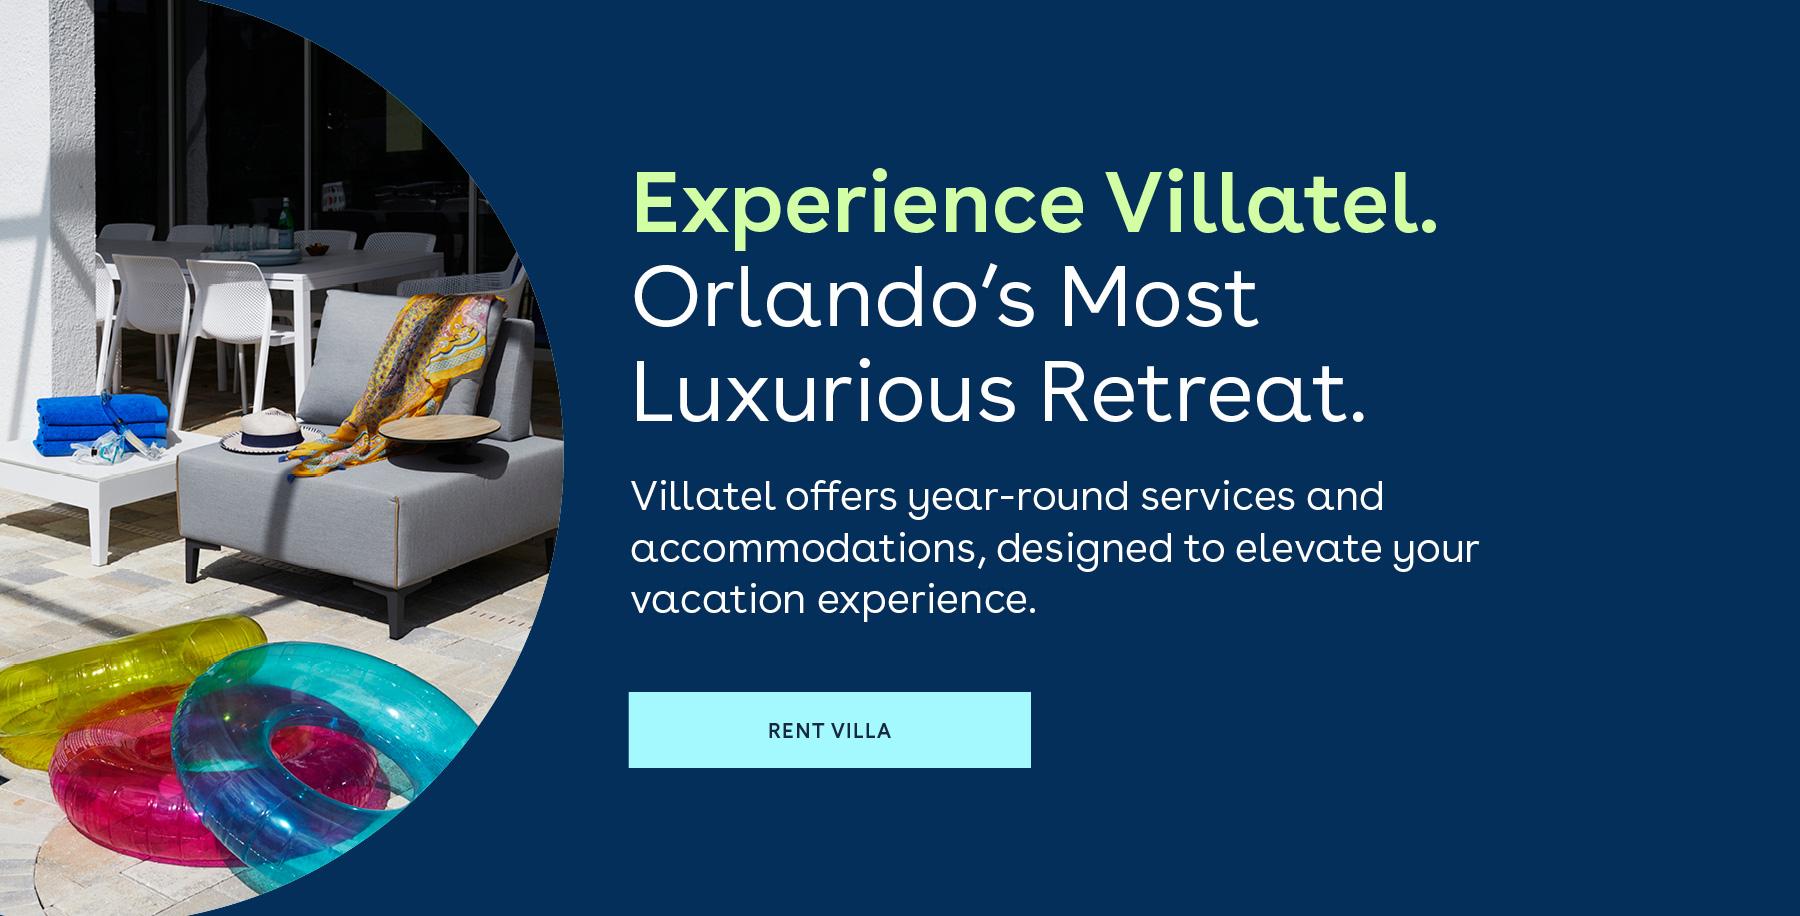 monthly vacation rentals orlando